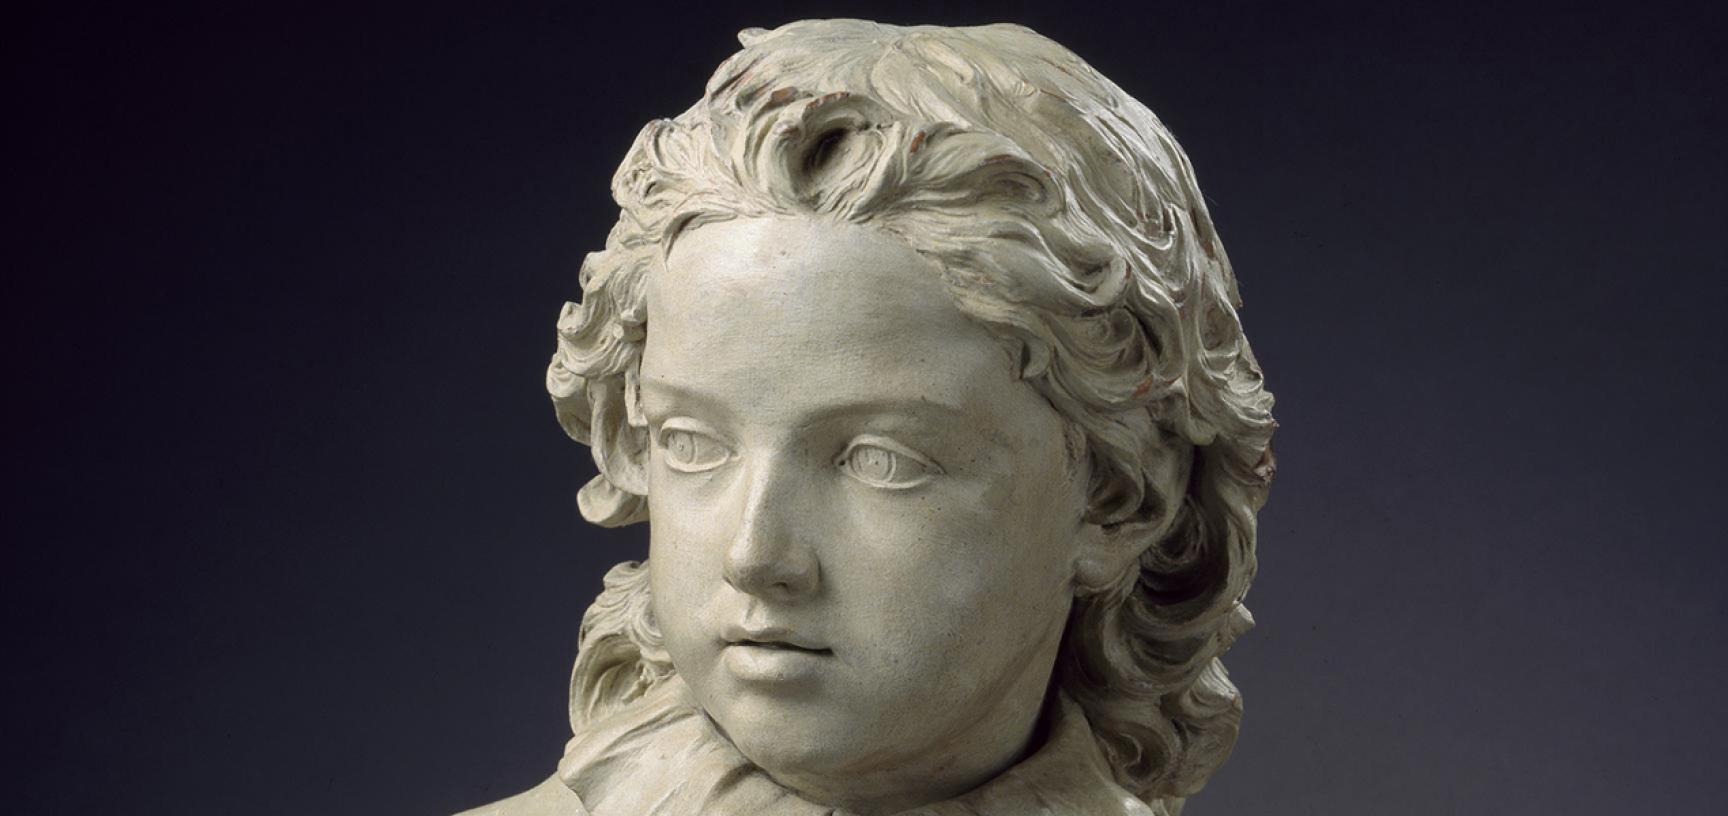 ashmolean arts of the 18th century